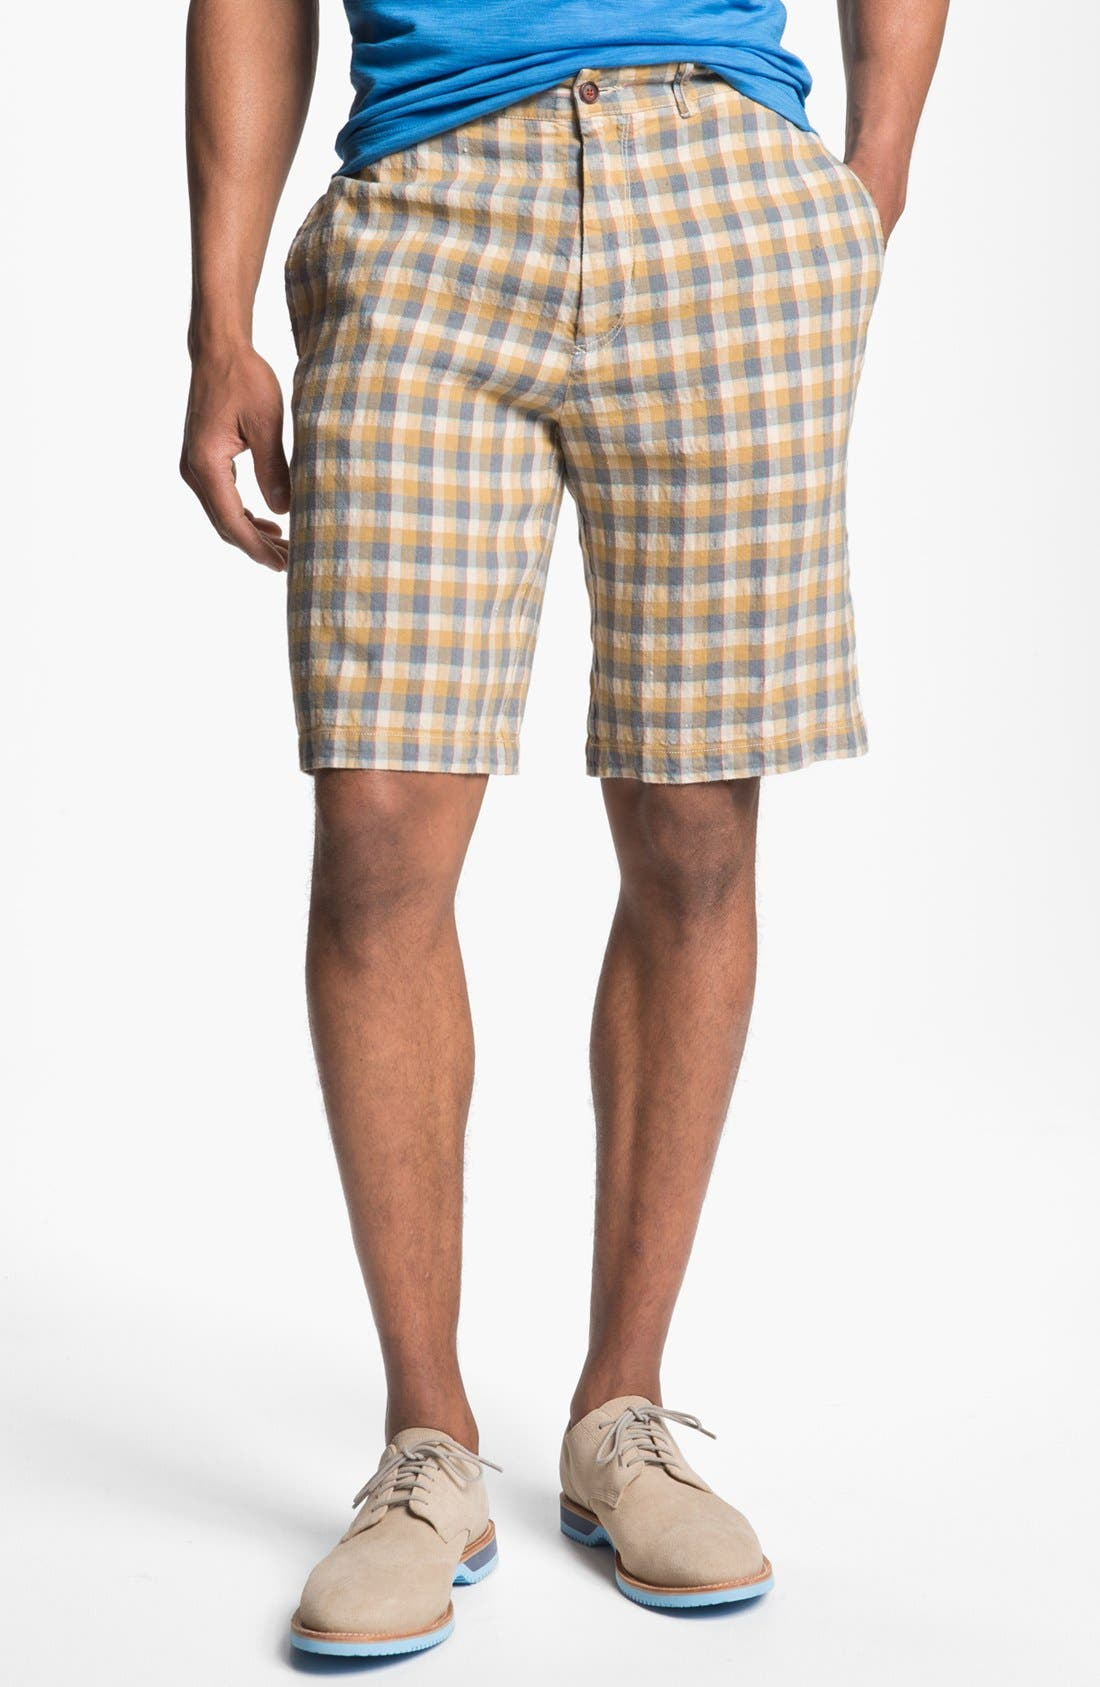 Alternate Image 1 Selected - Tommy Bahama 'Art Checko' Shorts